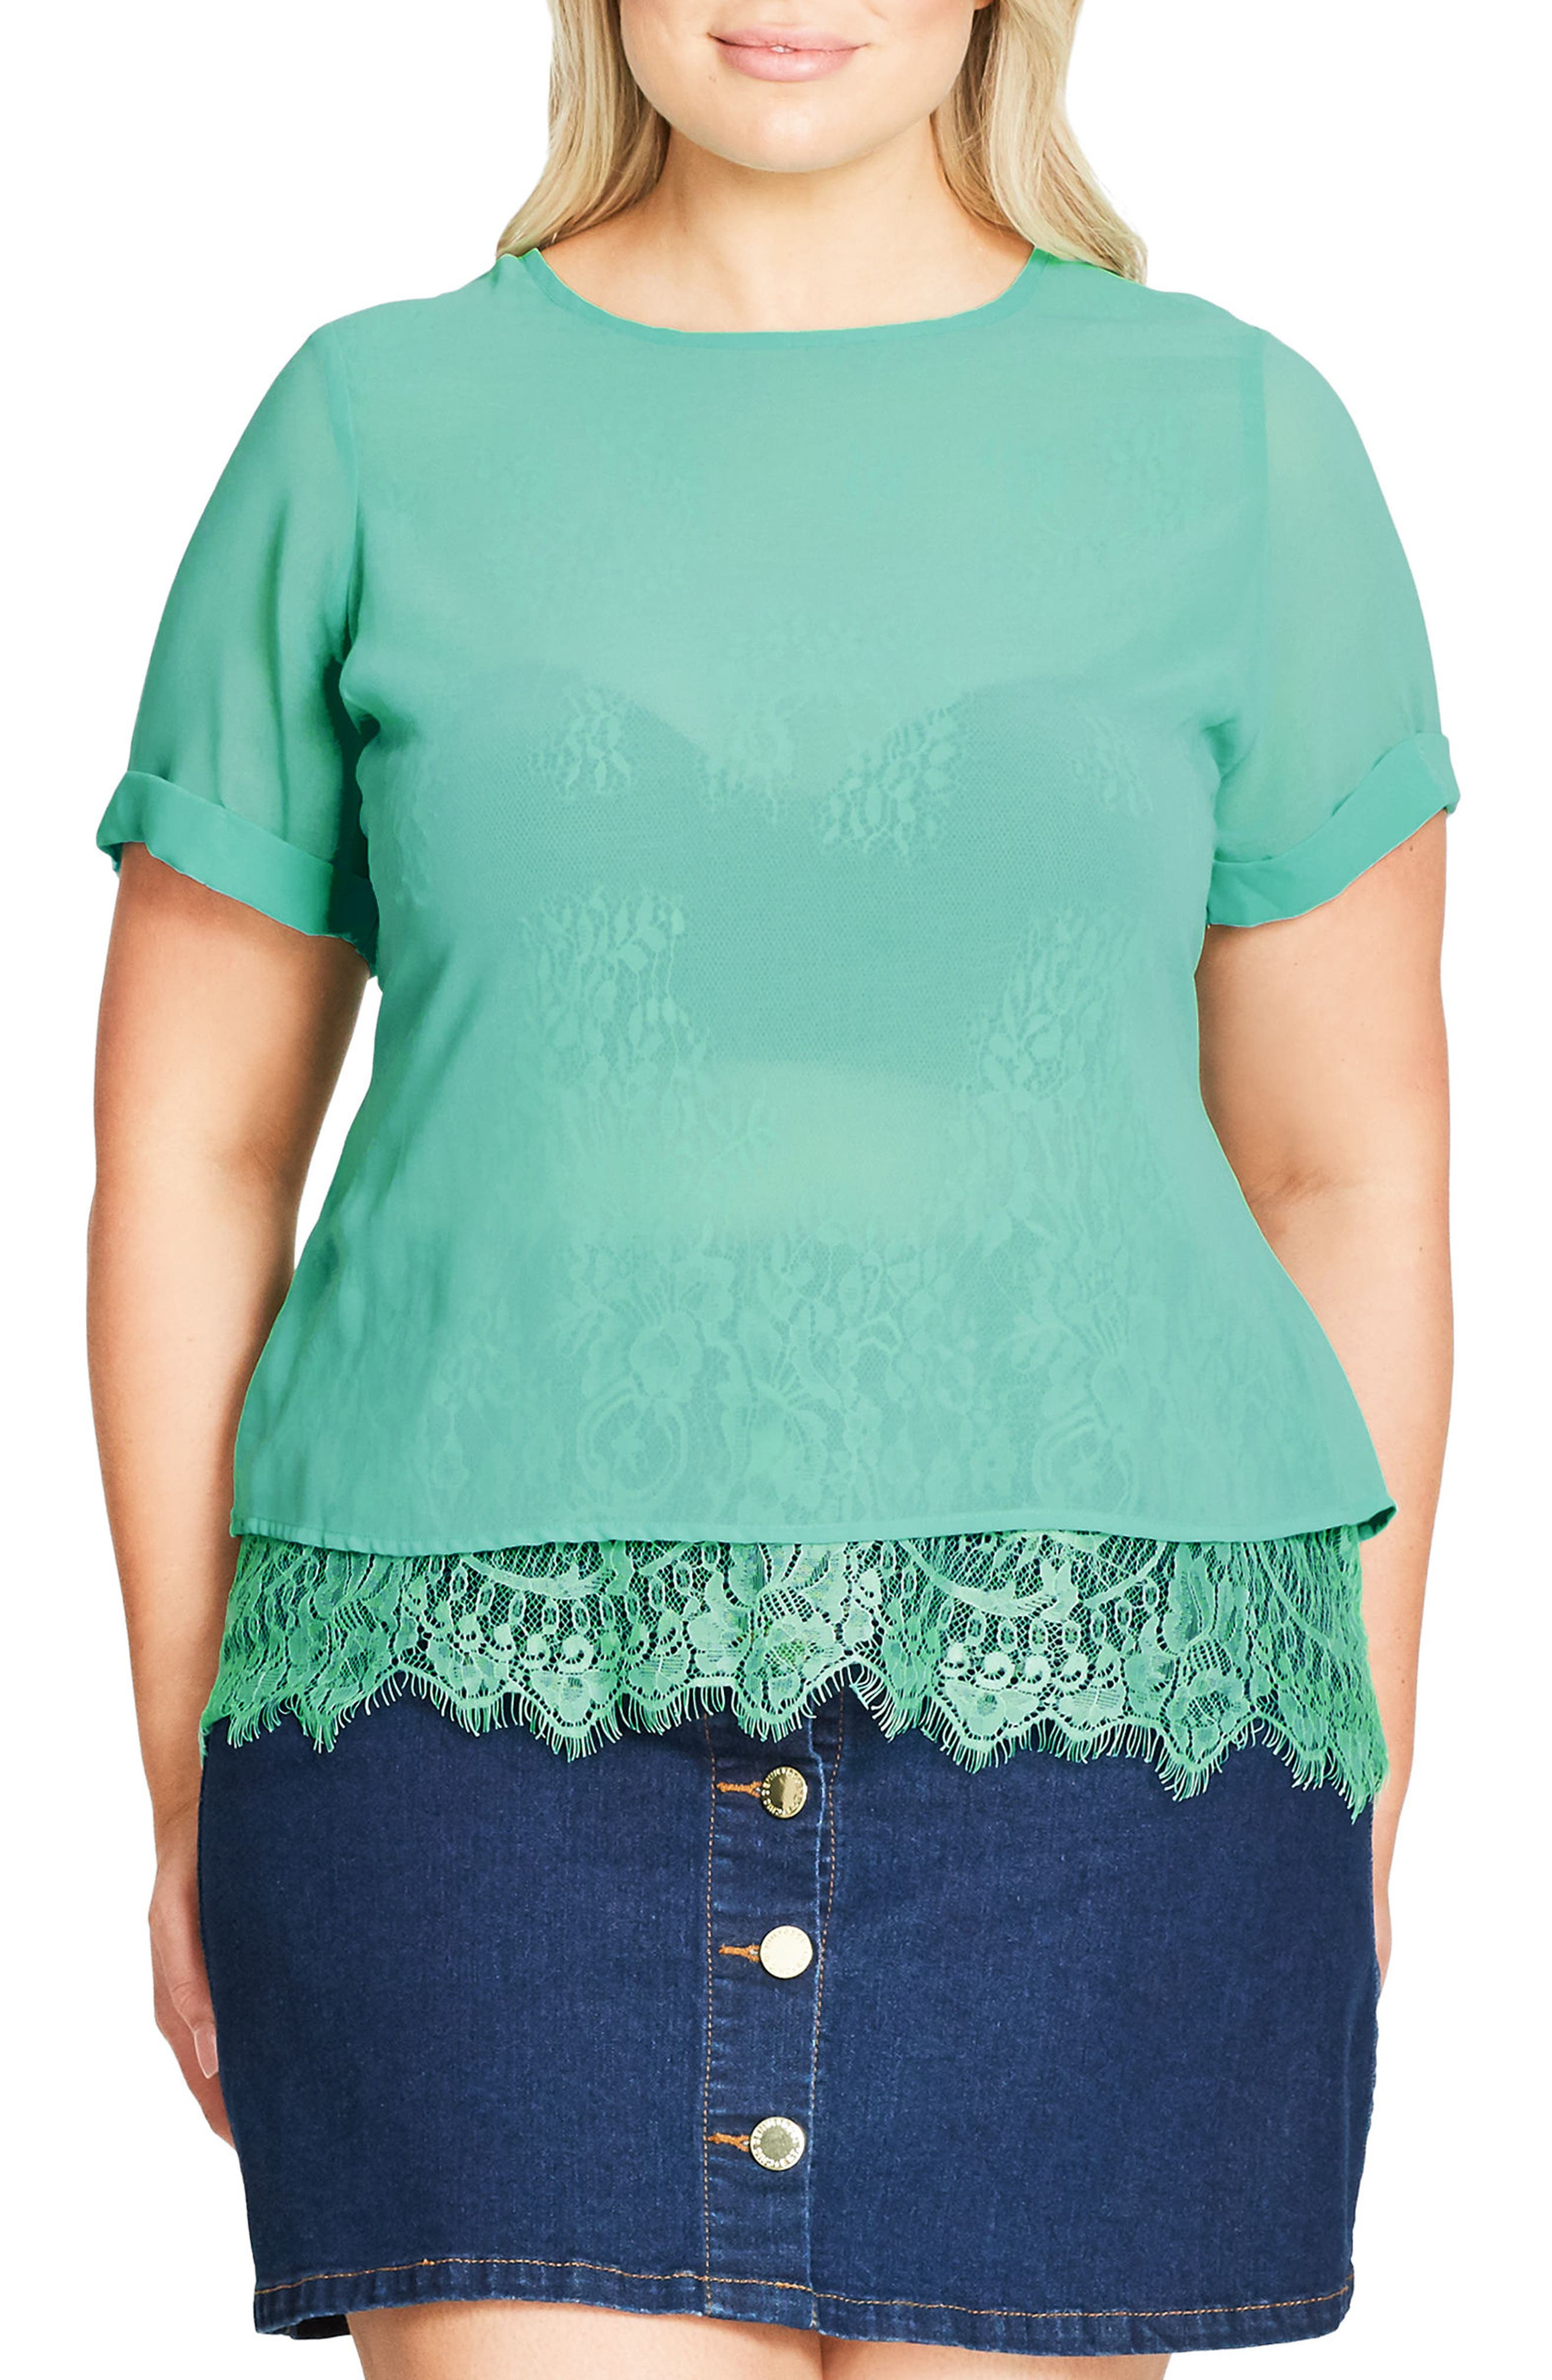 Lace Scallop Top,                         Main,                         color, 300